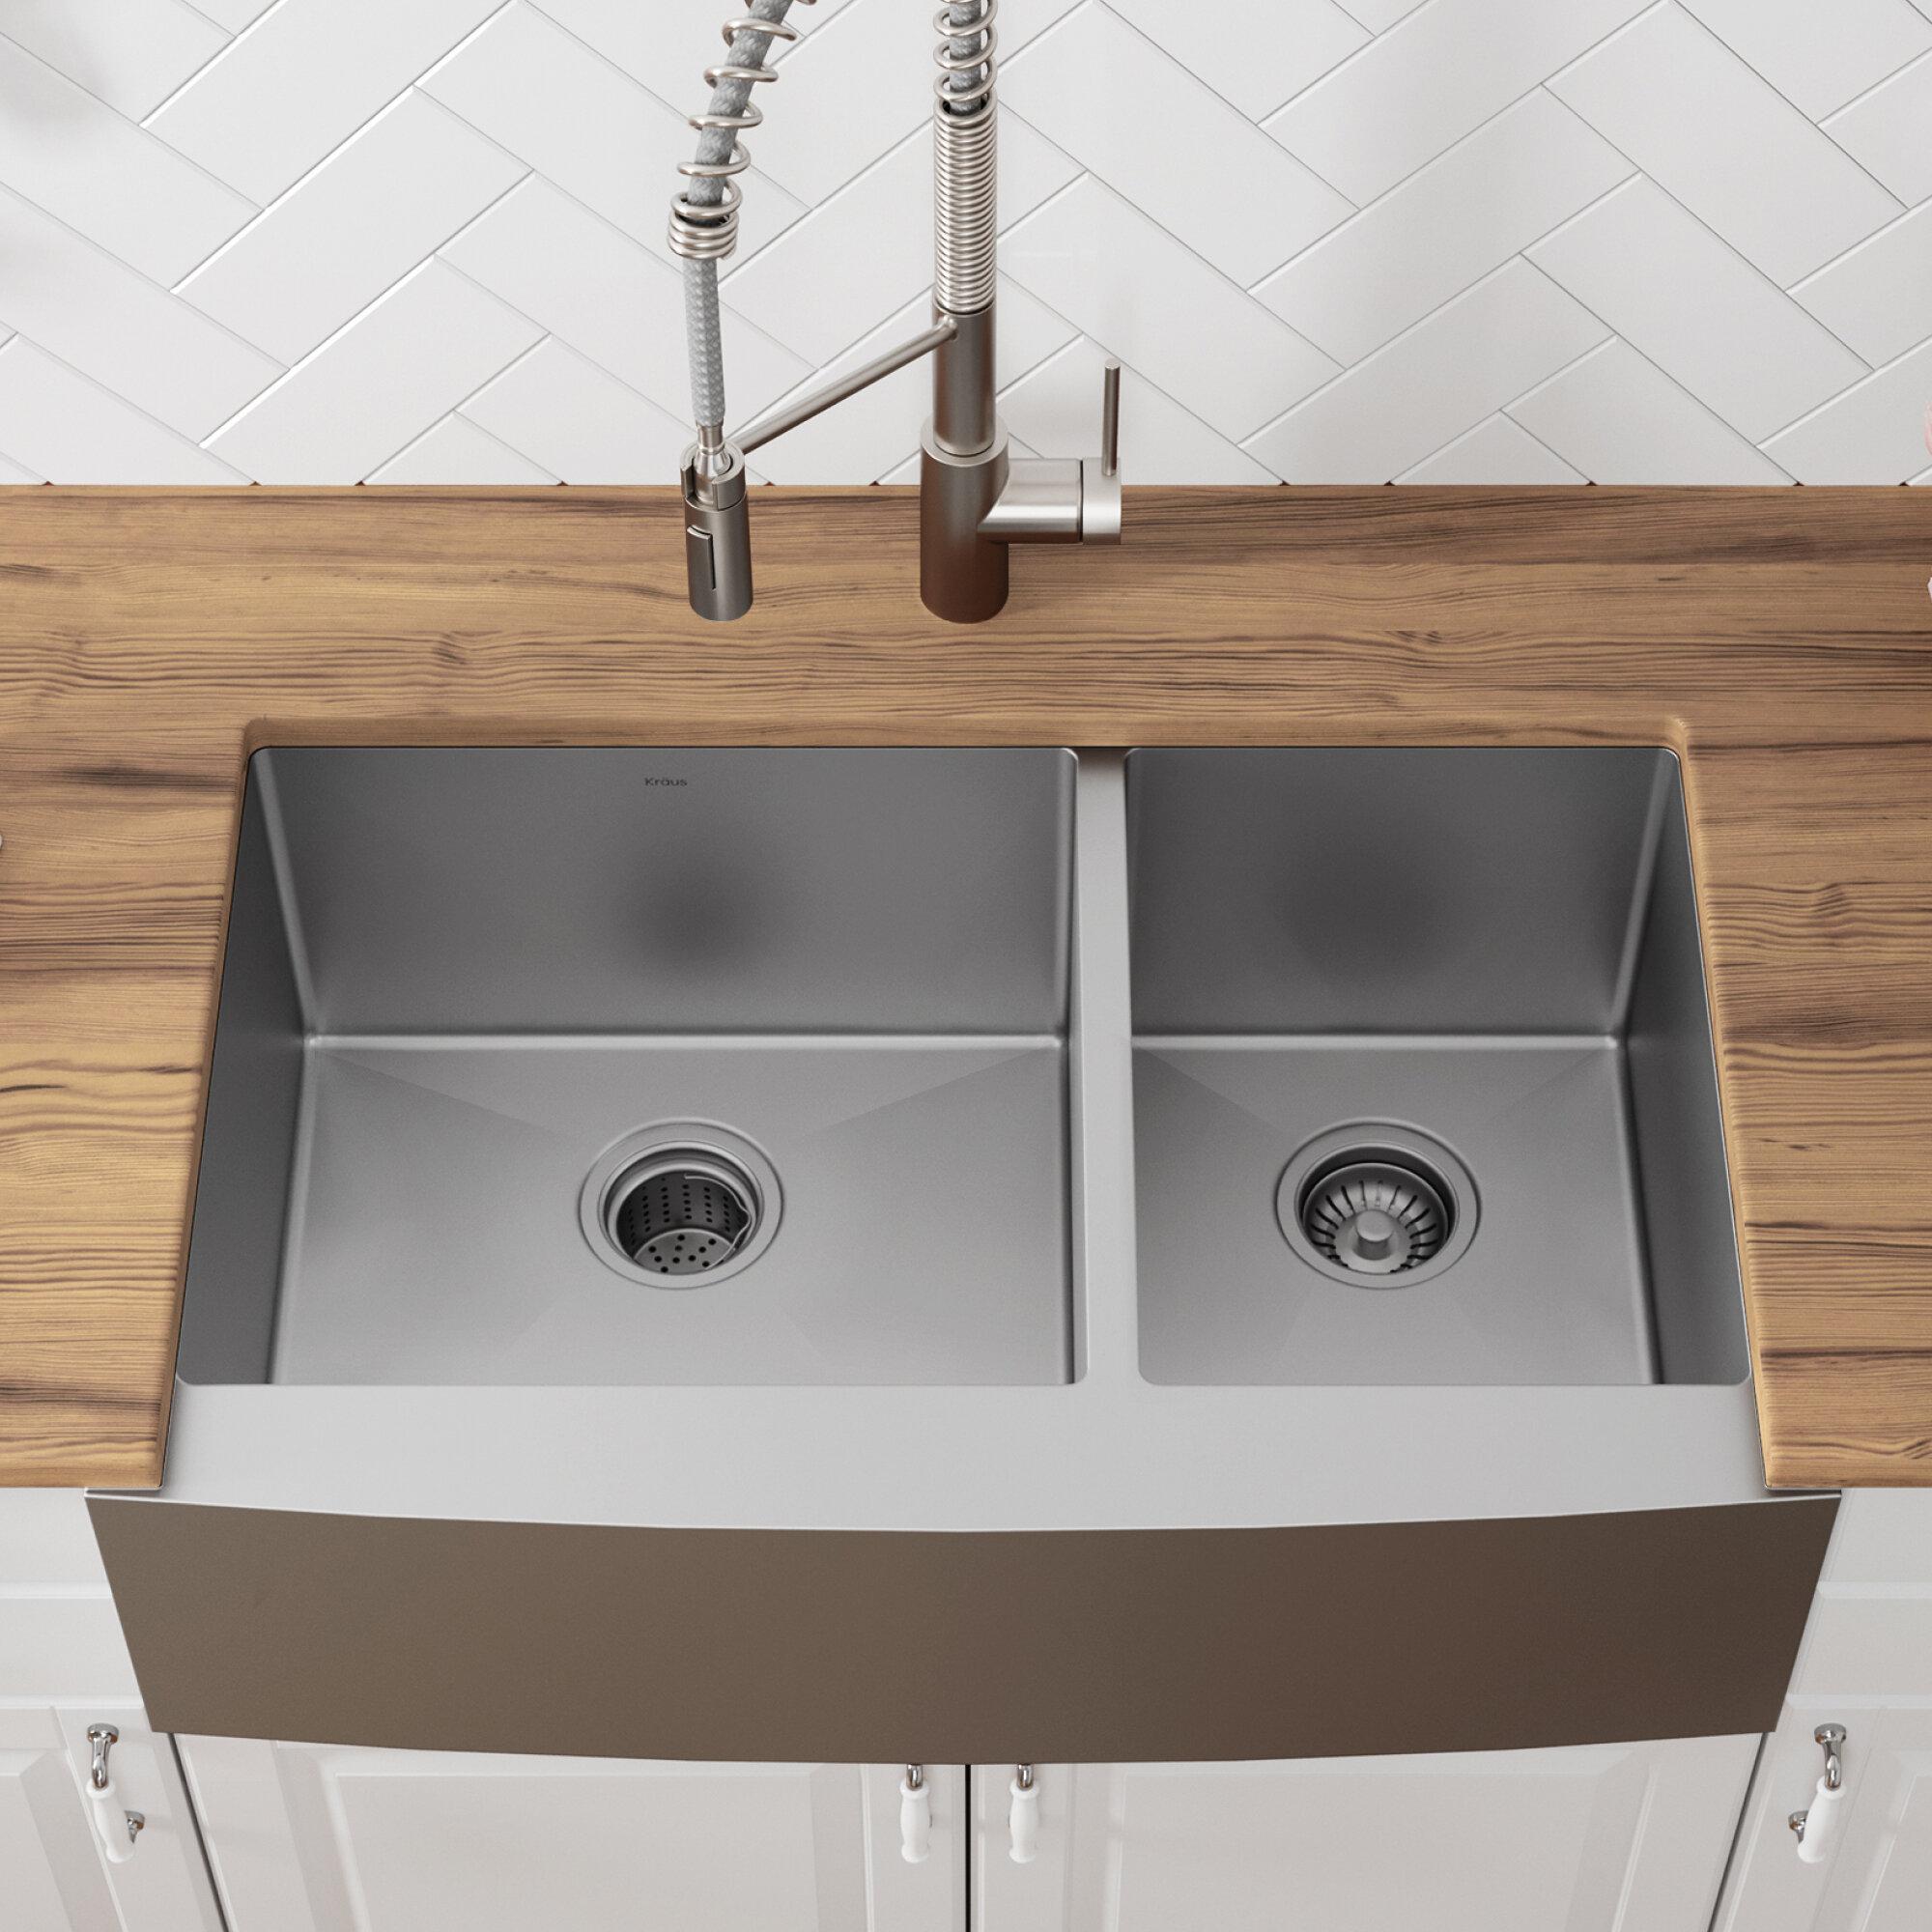 Astonishing 36 L X 21 W Double Basin Farmhouse Kitchen Sink With Basket Strainer Download Free Architecture Designs Scobabritishbridgeorg